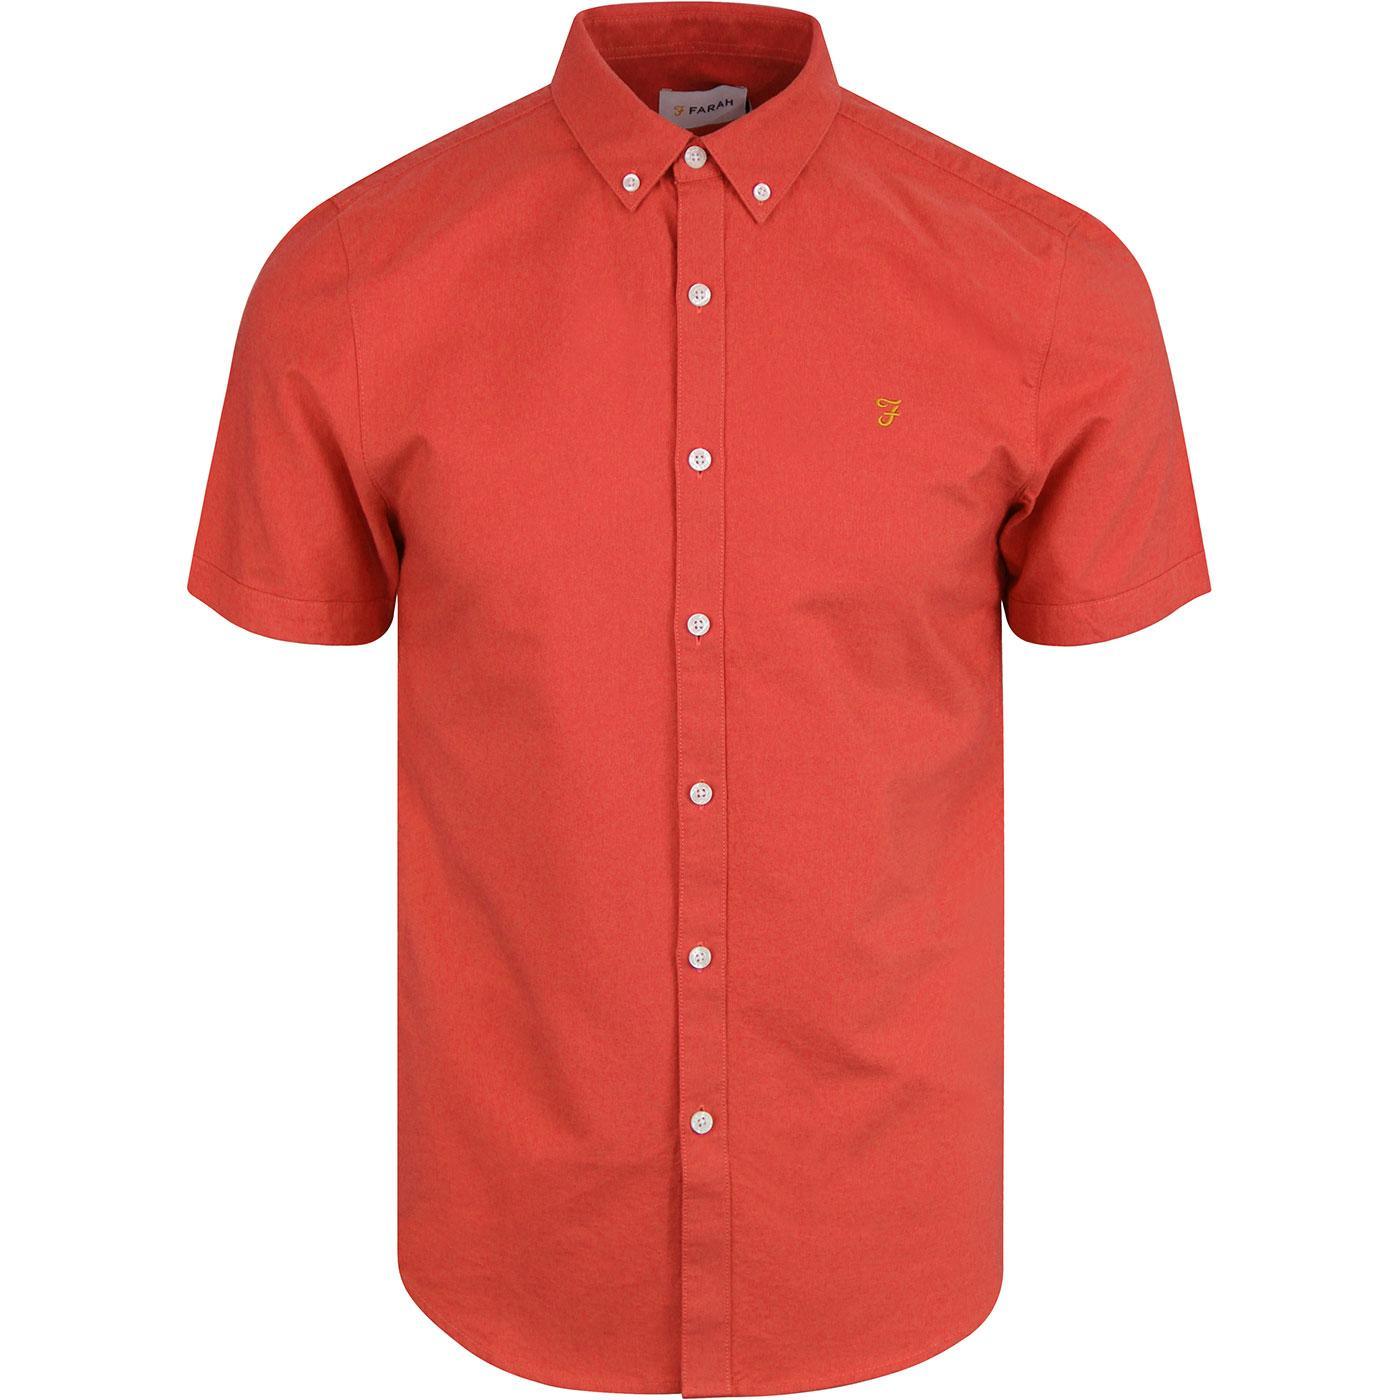 Brewer FARAH Slim Retro S/S Oxford Shirt RED COAT